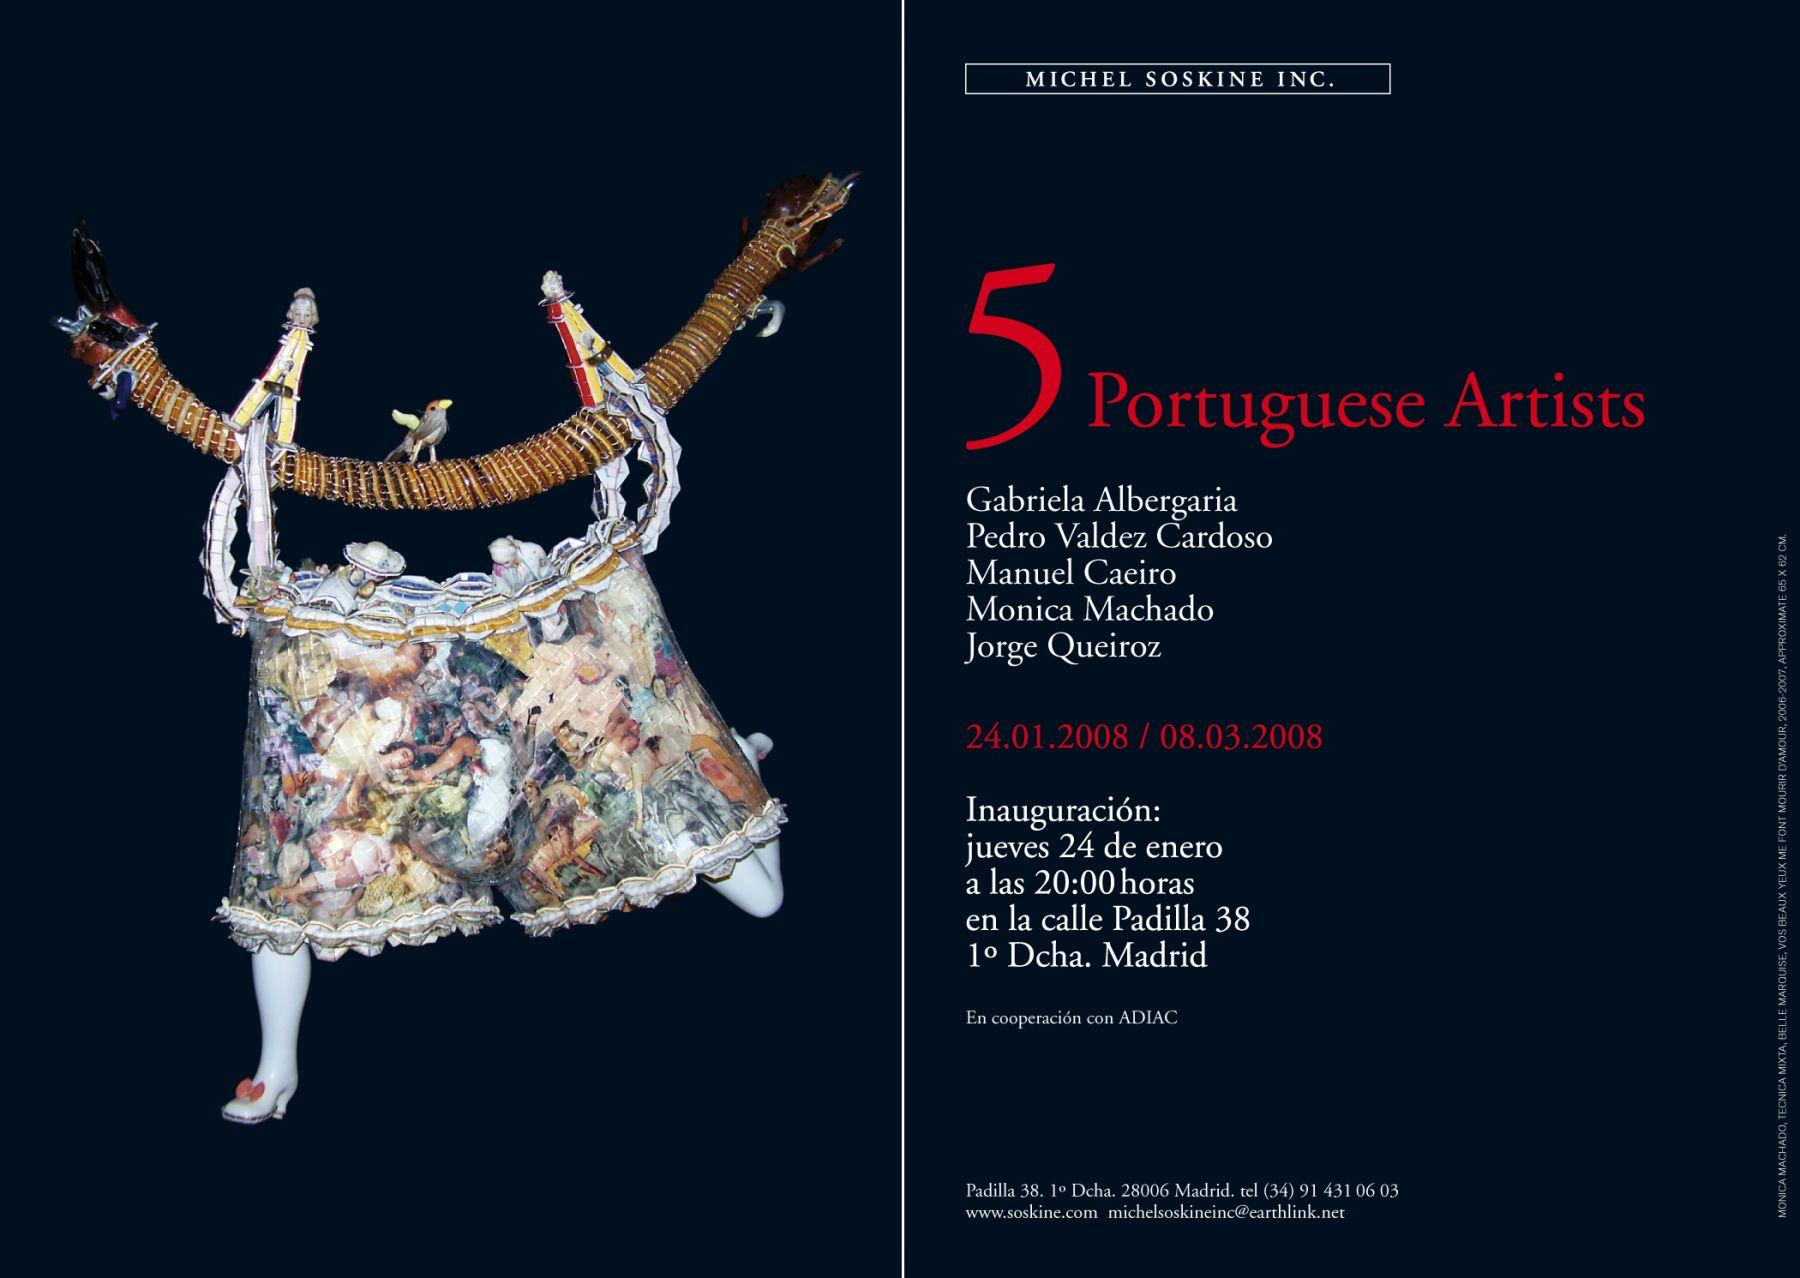 5 Portuguese Artists